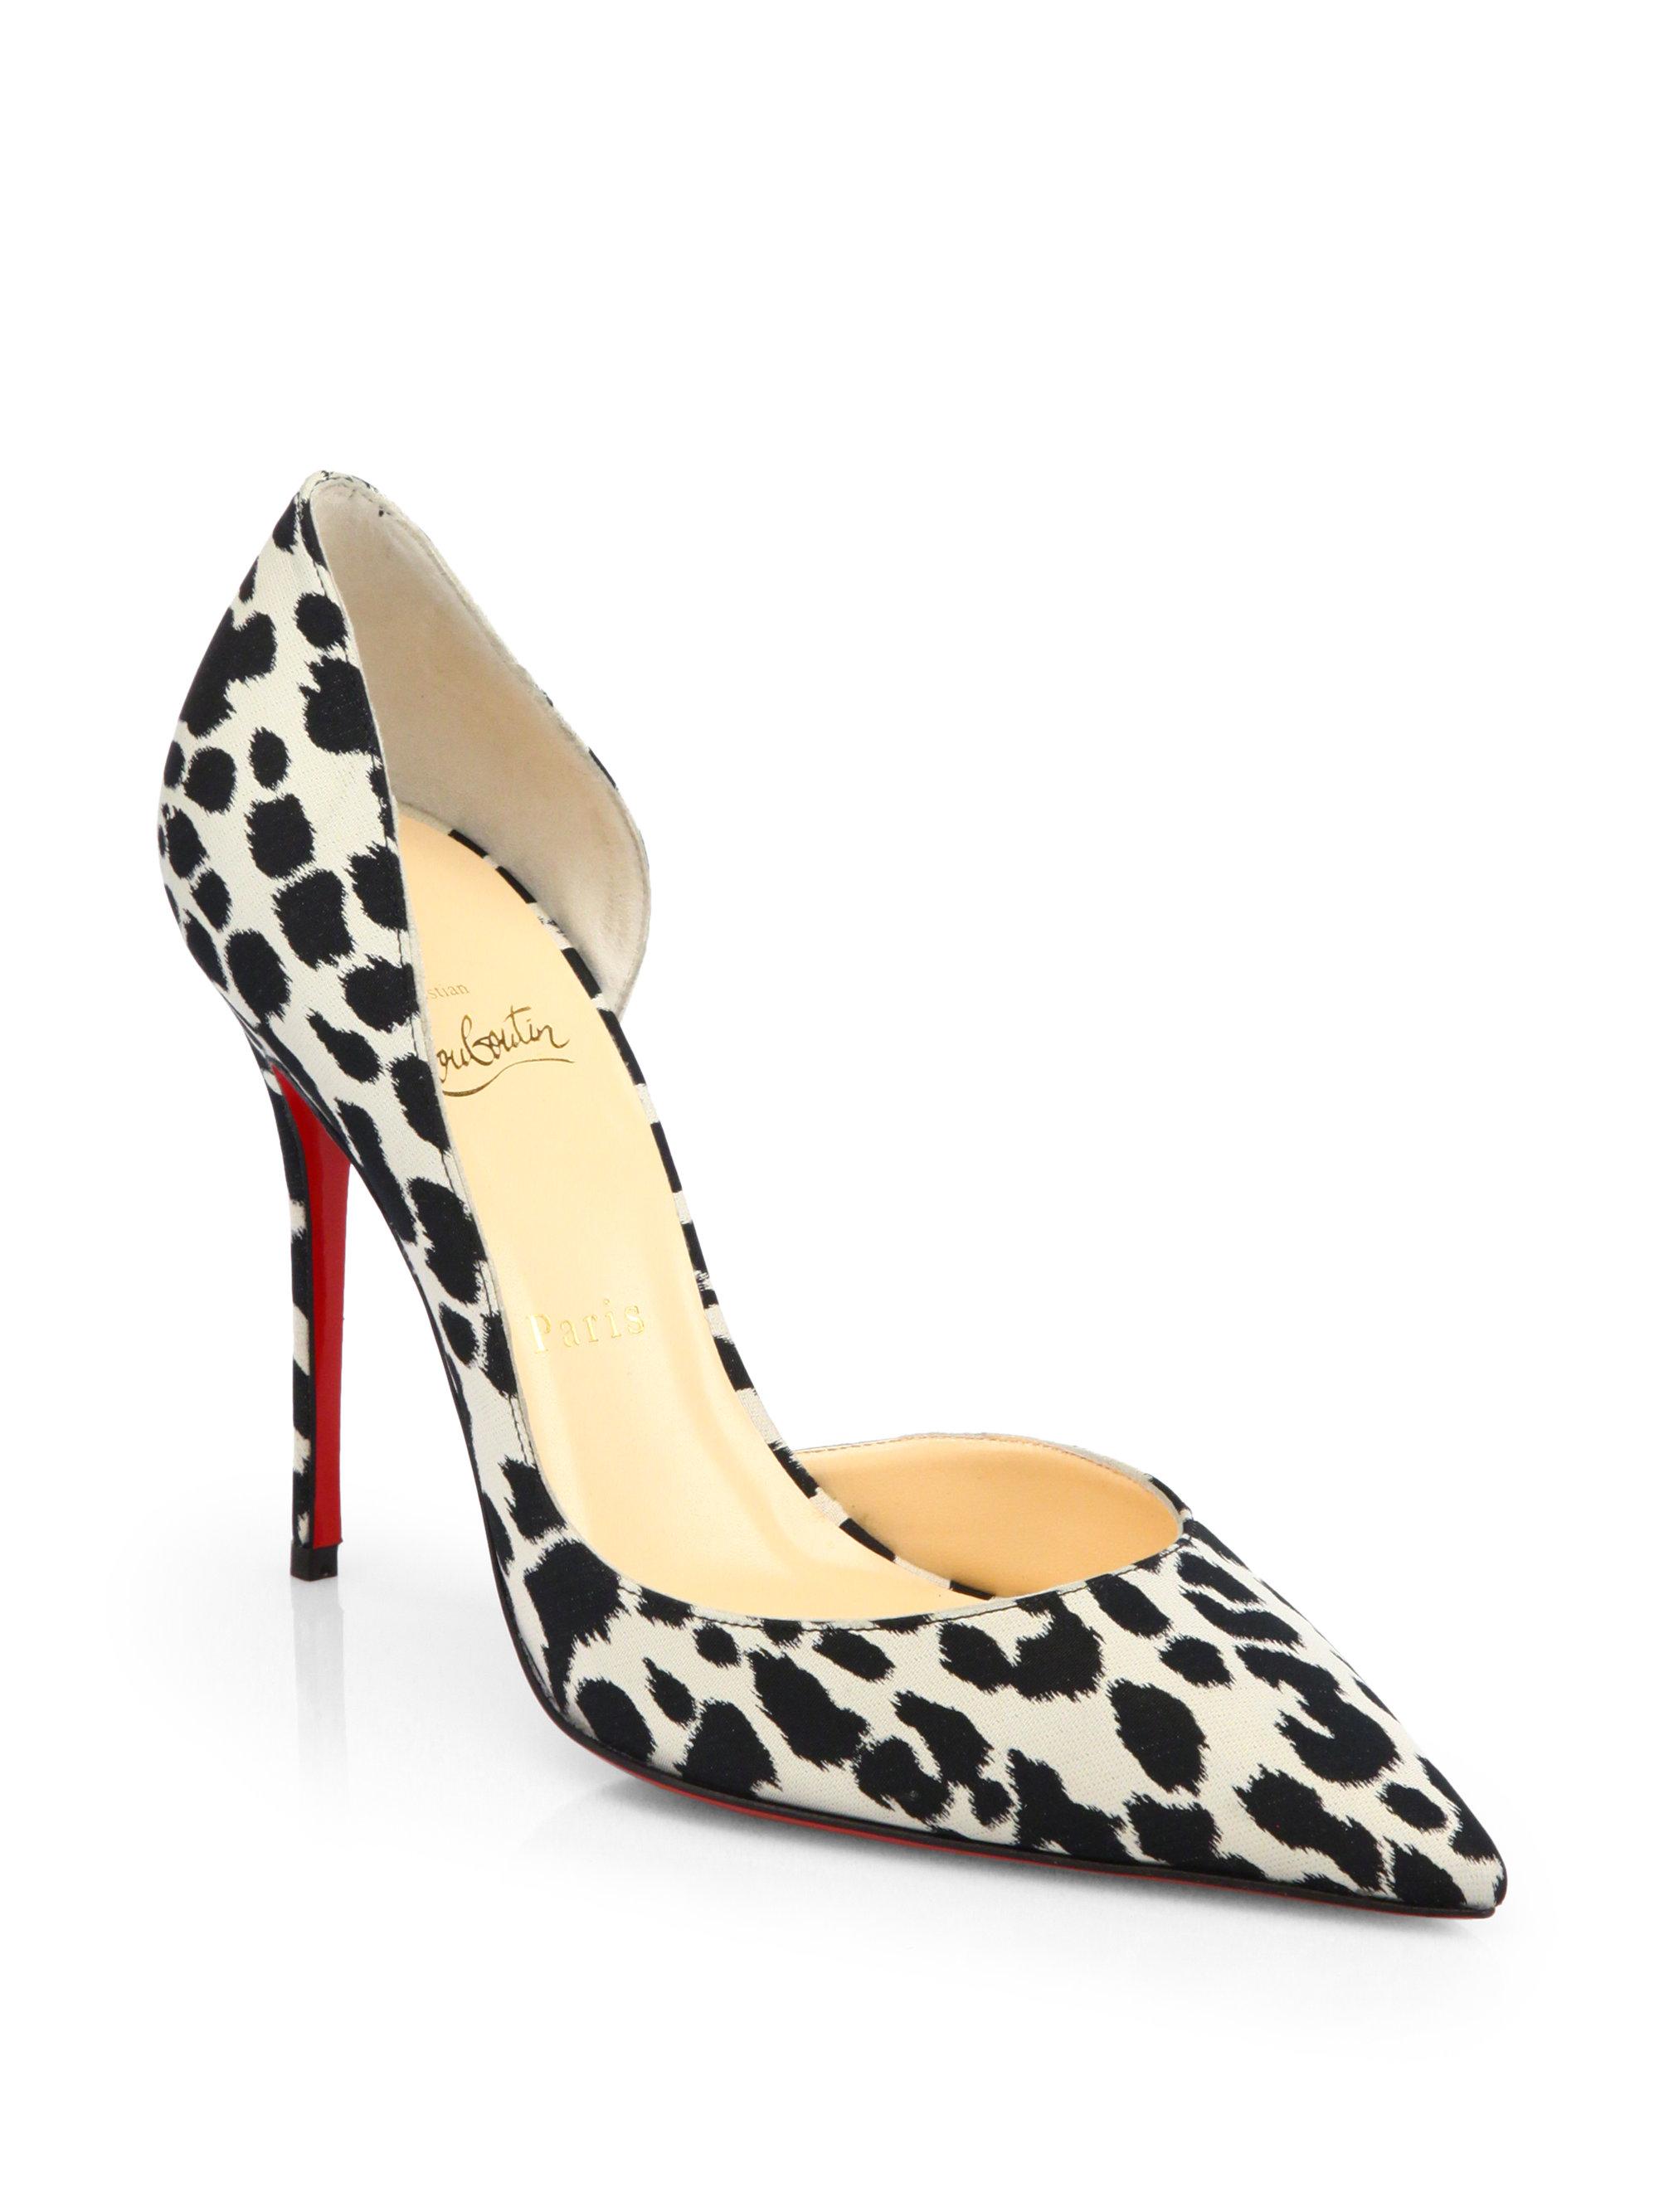 Artesur ? christian louboutin peep-toe pumps Metallic, black and ...